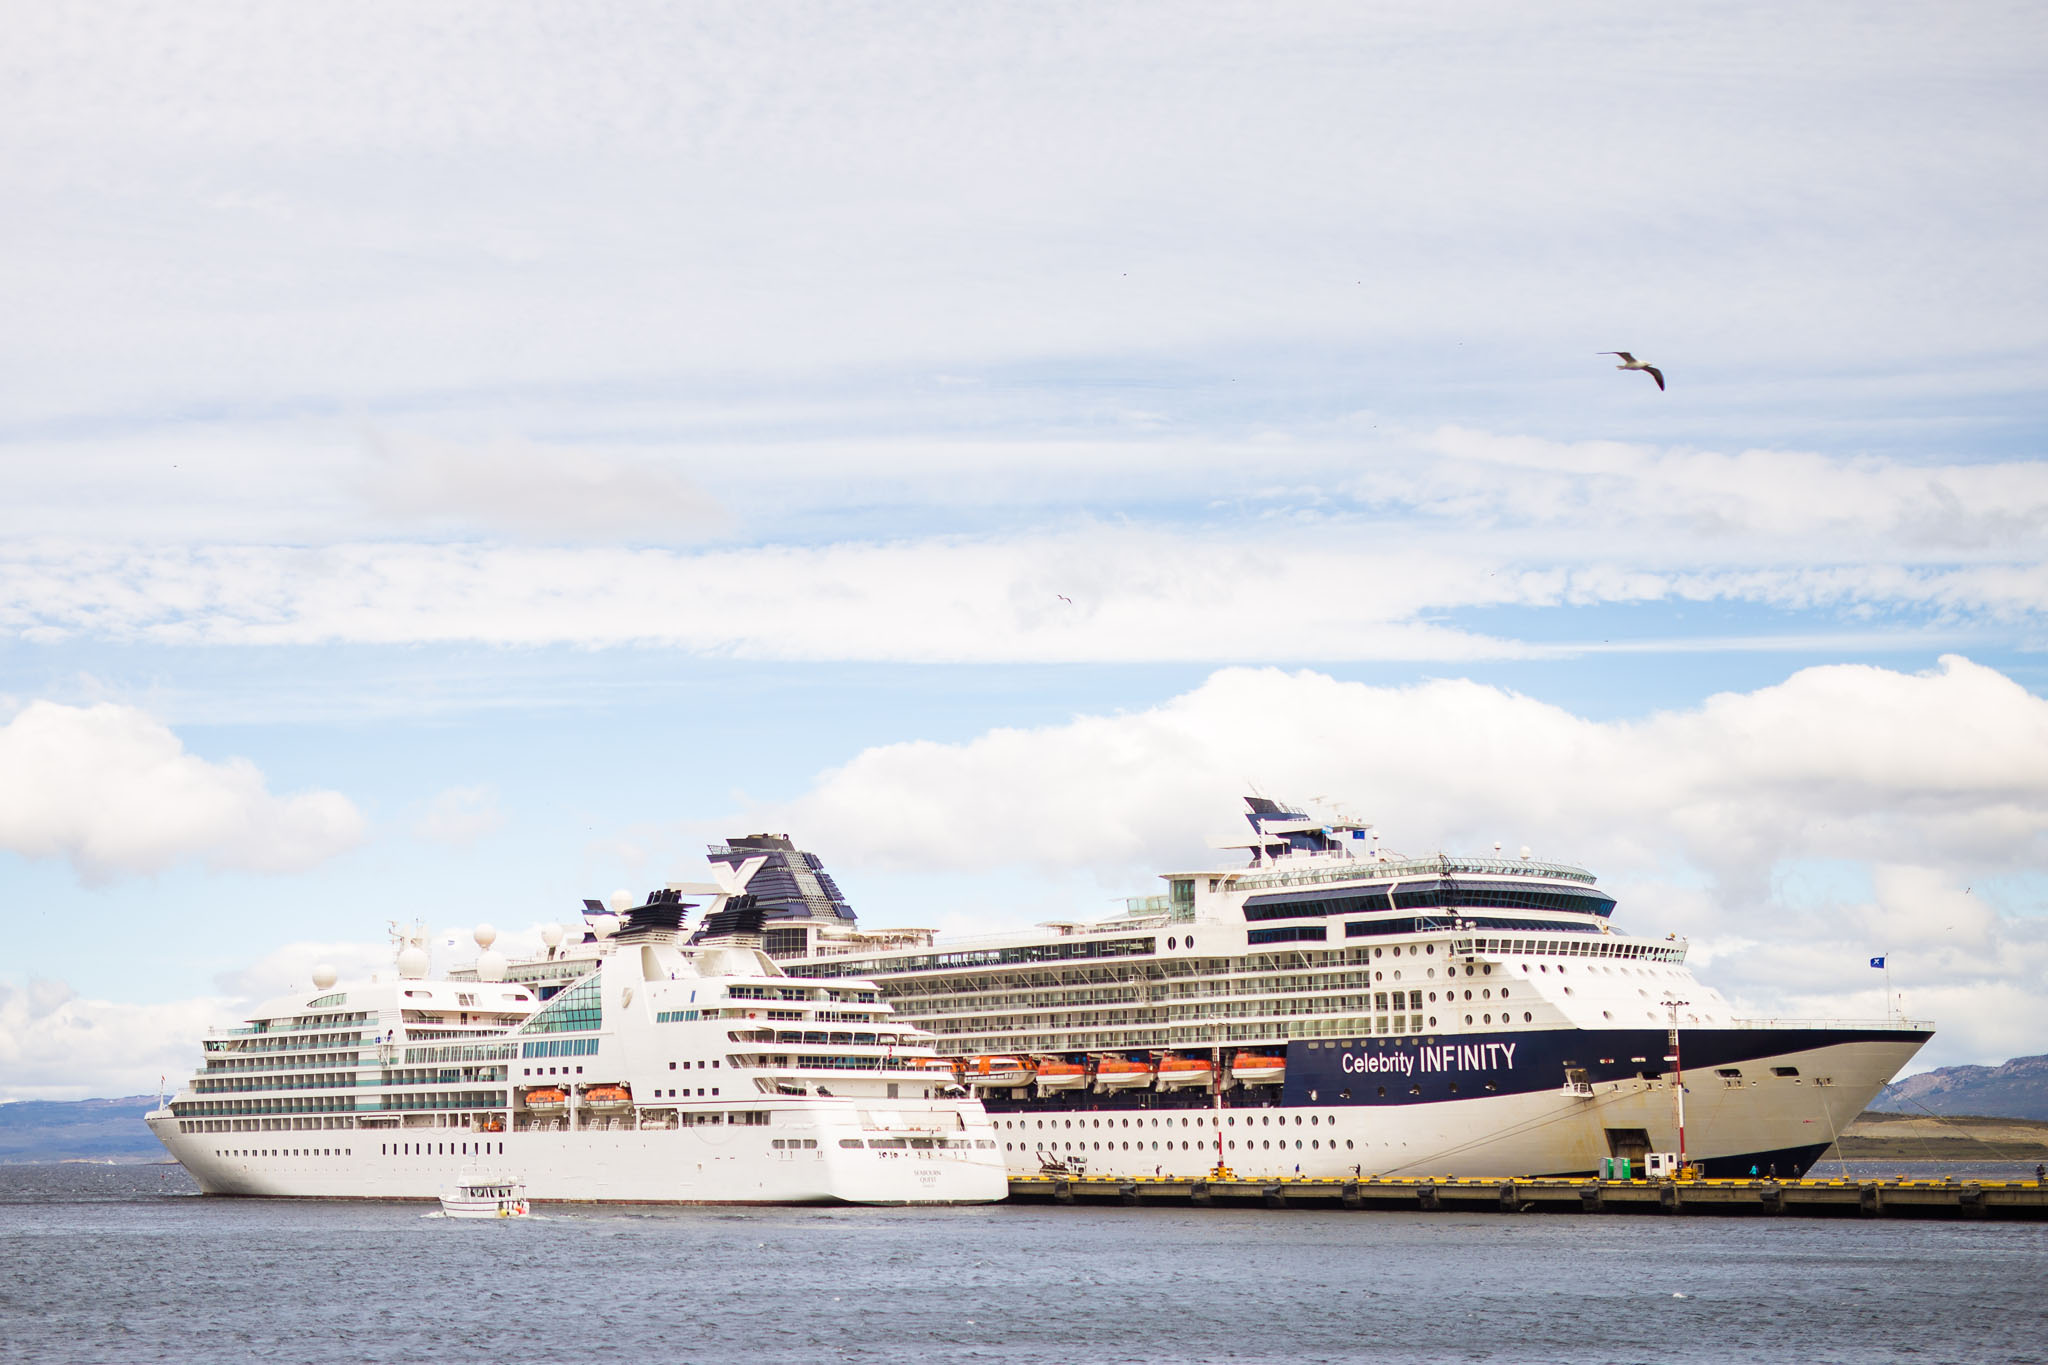 Wedding-travellers-ushuaia-argentina-cruis-tour-ships-antarctica